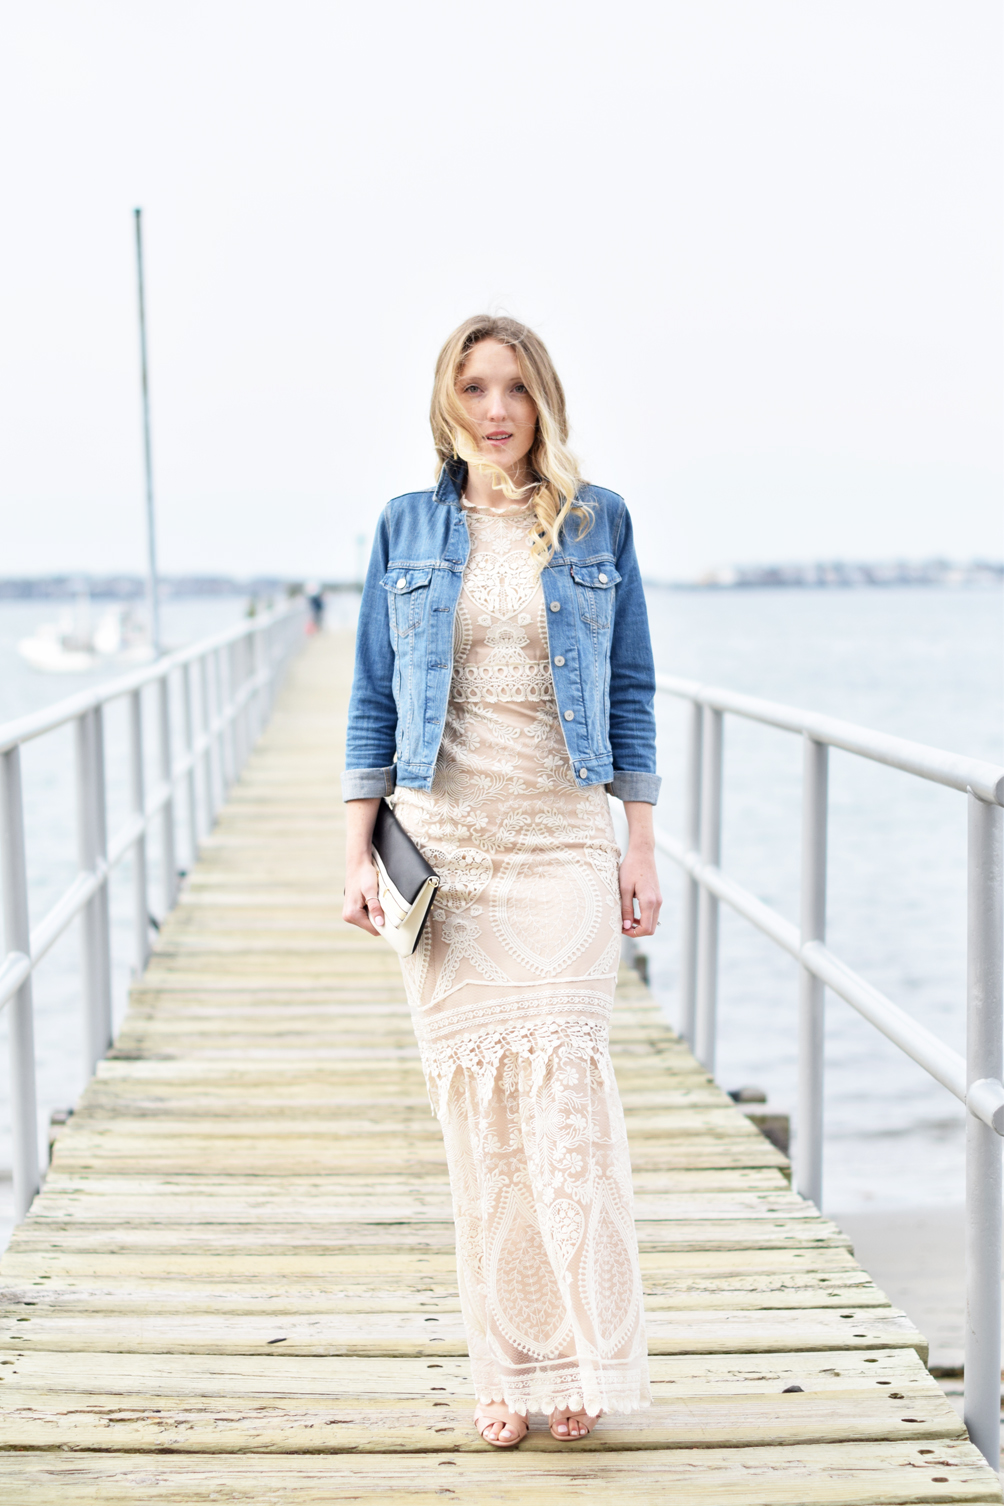 BHLDN peekaboo lace dress with vintage denim jacket - one brass fox